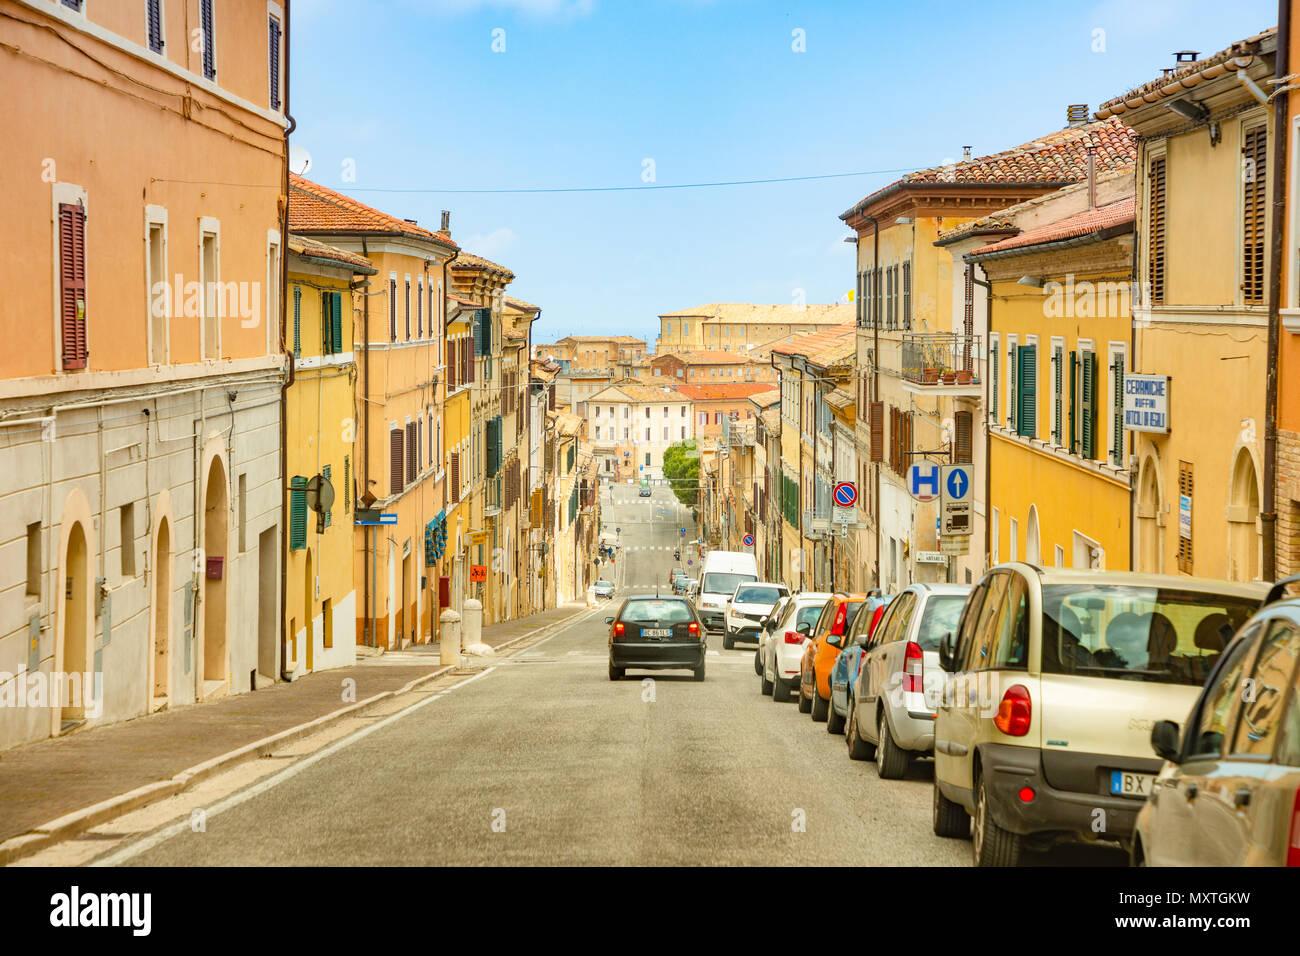 Loreto, Ancona, Italy - 8.05.2018: The central street of Loreto to Basilica of Santa Casa with people and cars, Italy - Stock Image